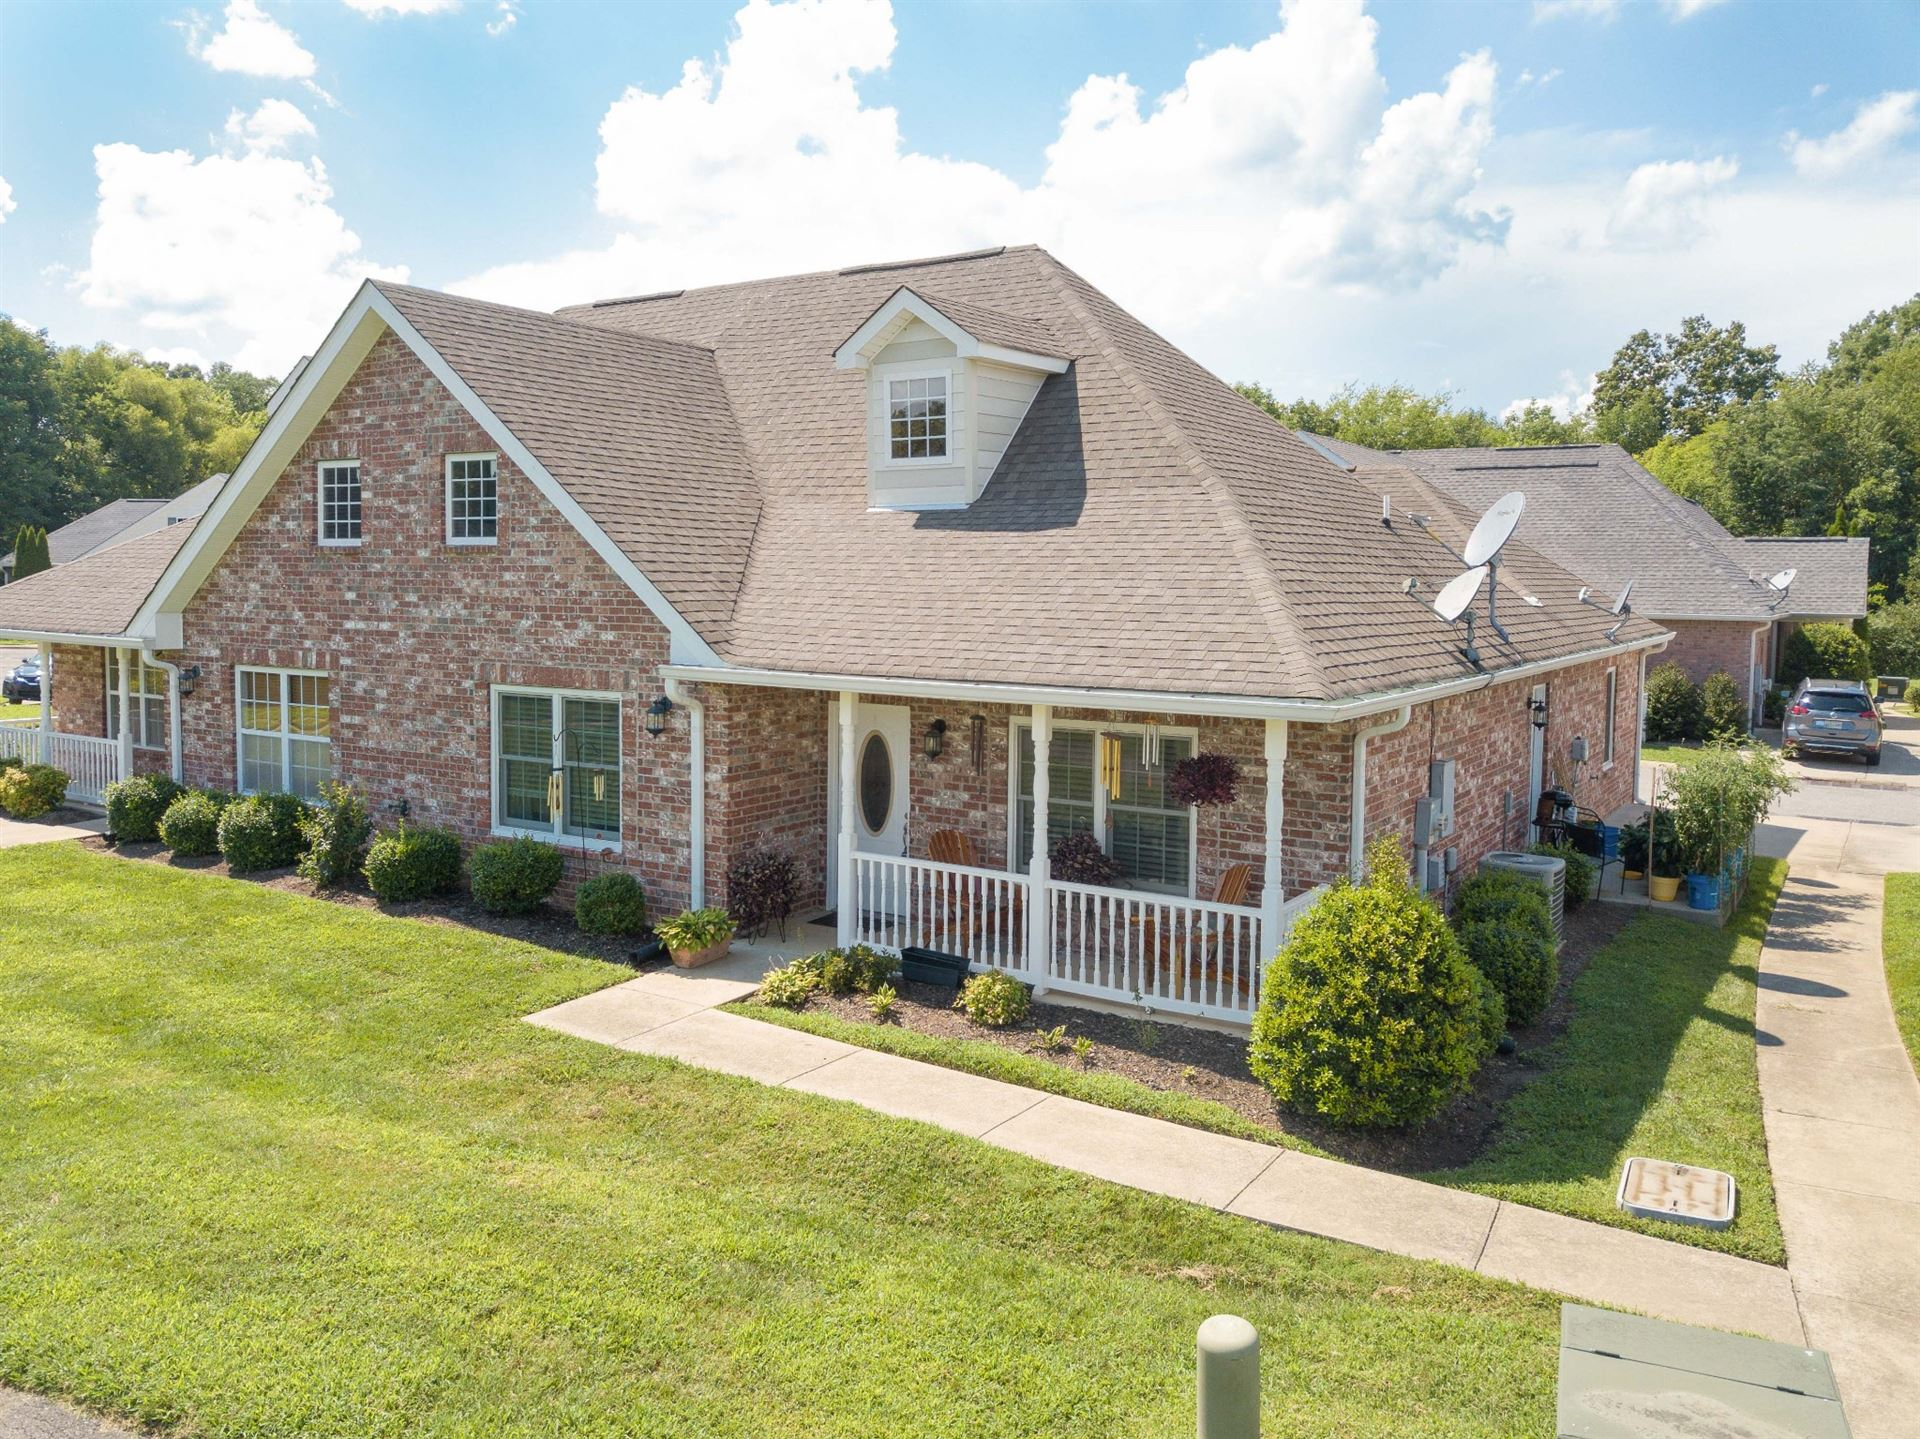 113 Shore Dr, White House, TN 37188 - MLS#: 2171671